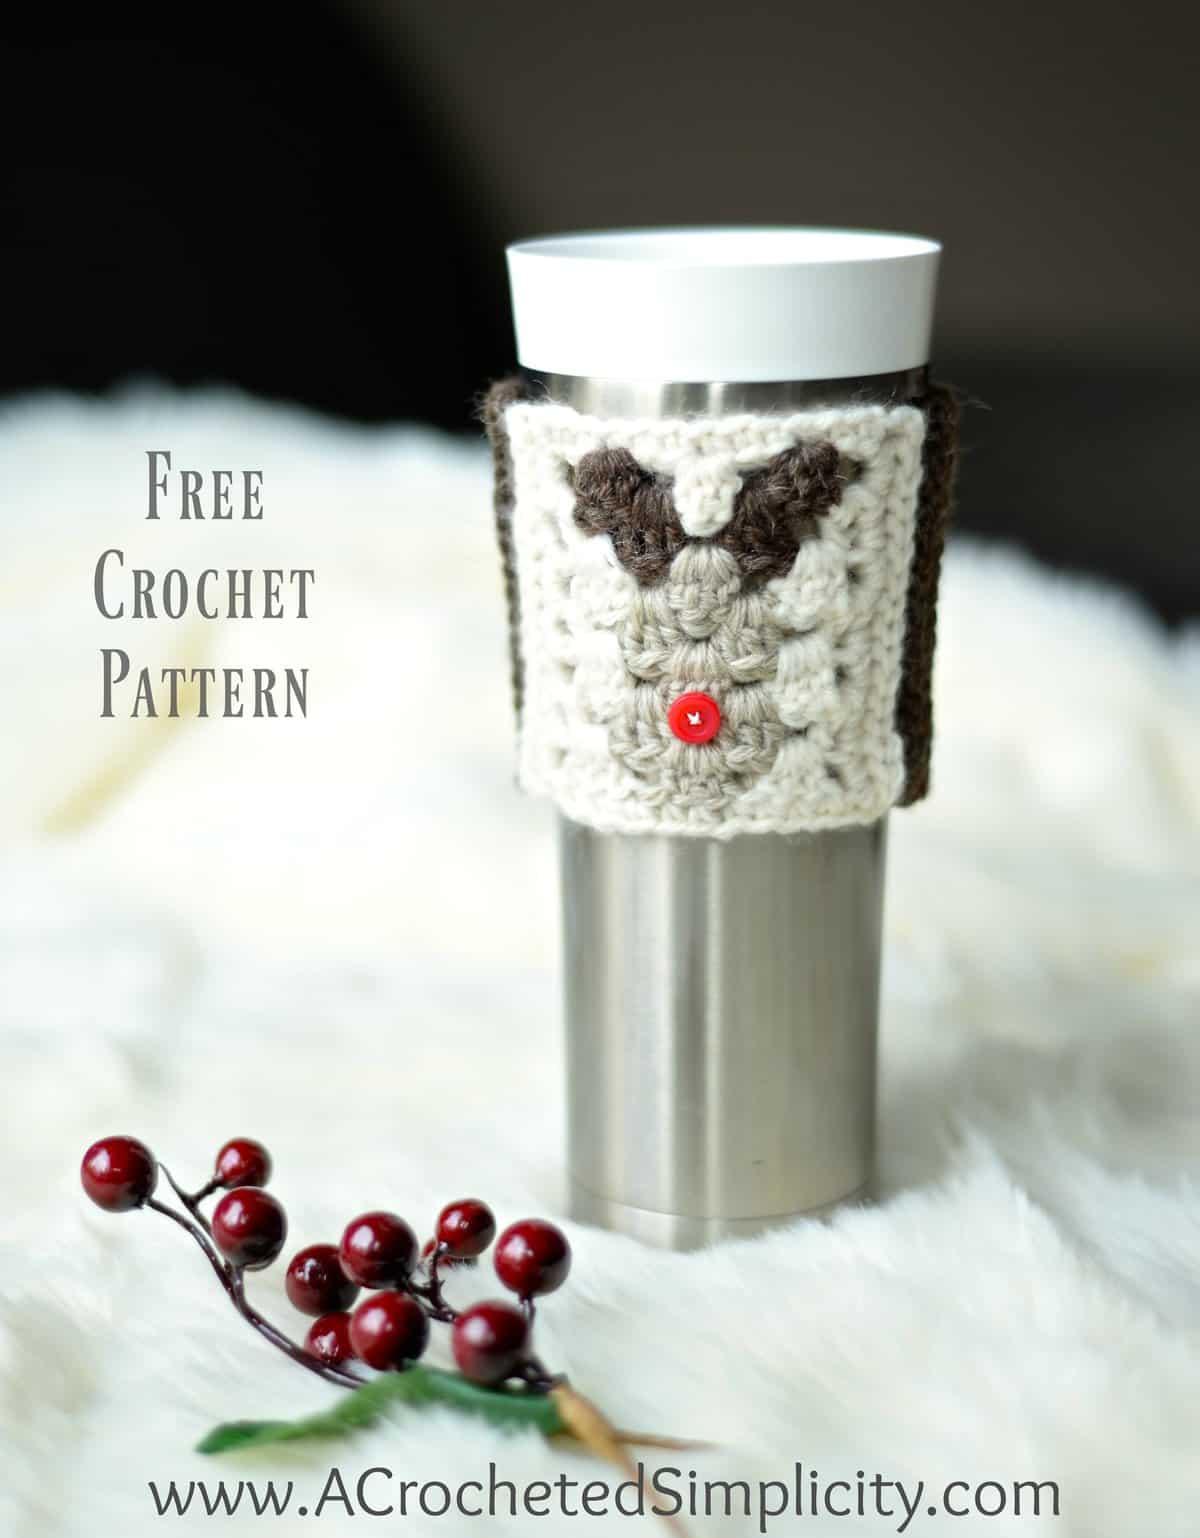 Free Crochet Pattern - Reindeer Coffee Cozy / Sleeve - A Crocheted ...